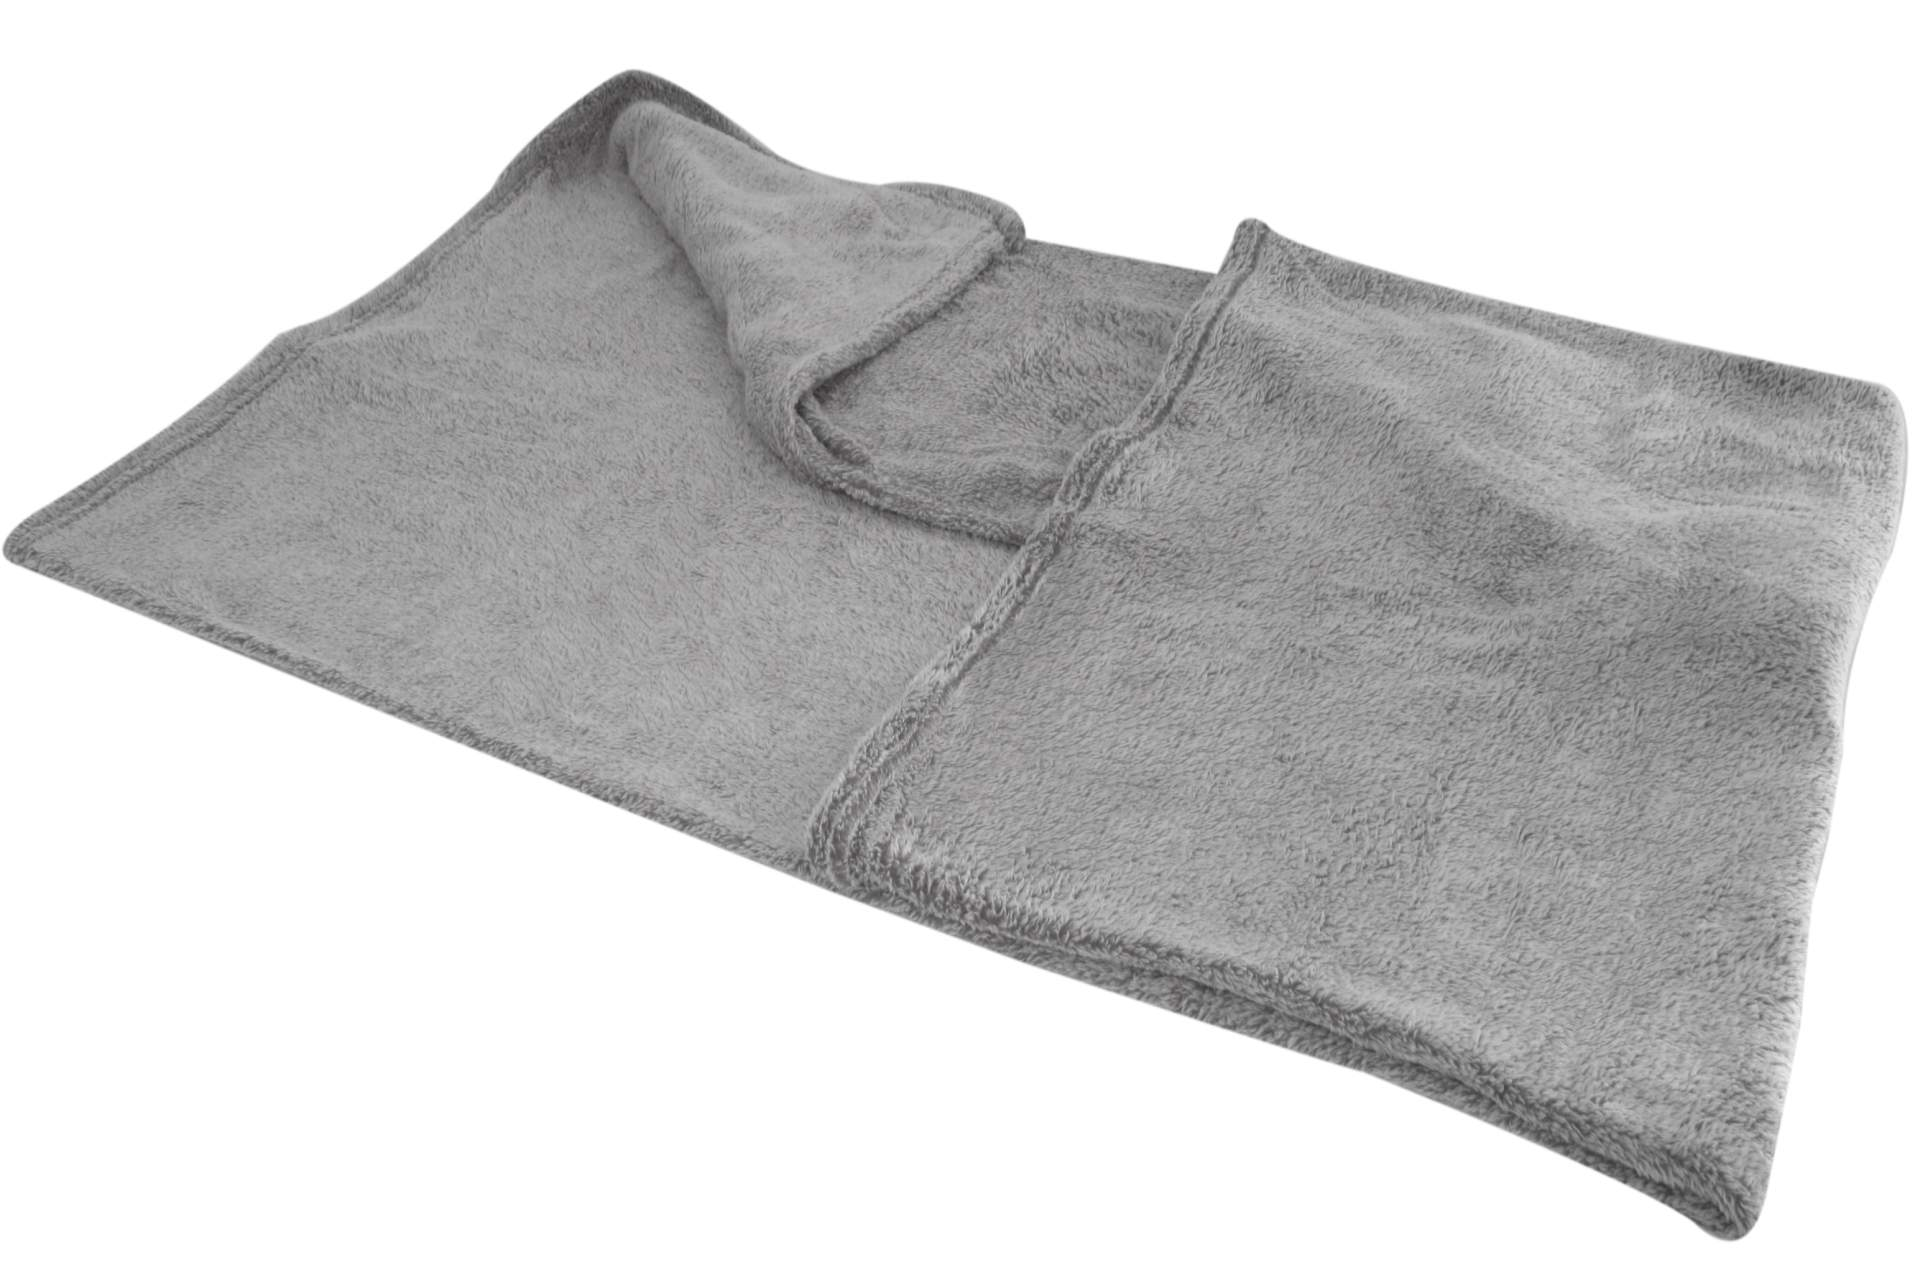 flanell wohndecke grau 200 x 150 cm kuscheldecke sofadecke flanelldecke decke ebay. Black Bedroom Furniture Sets. Home Design Ideas